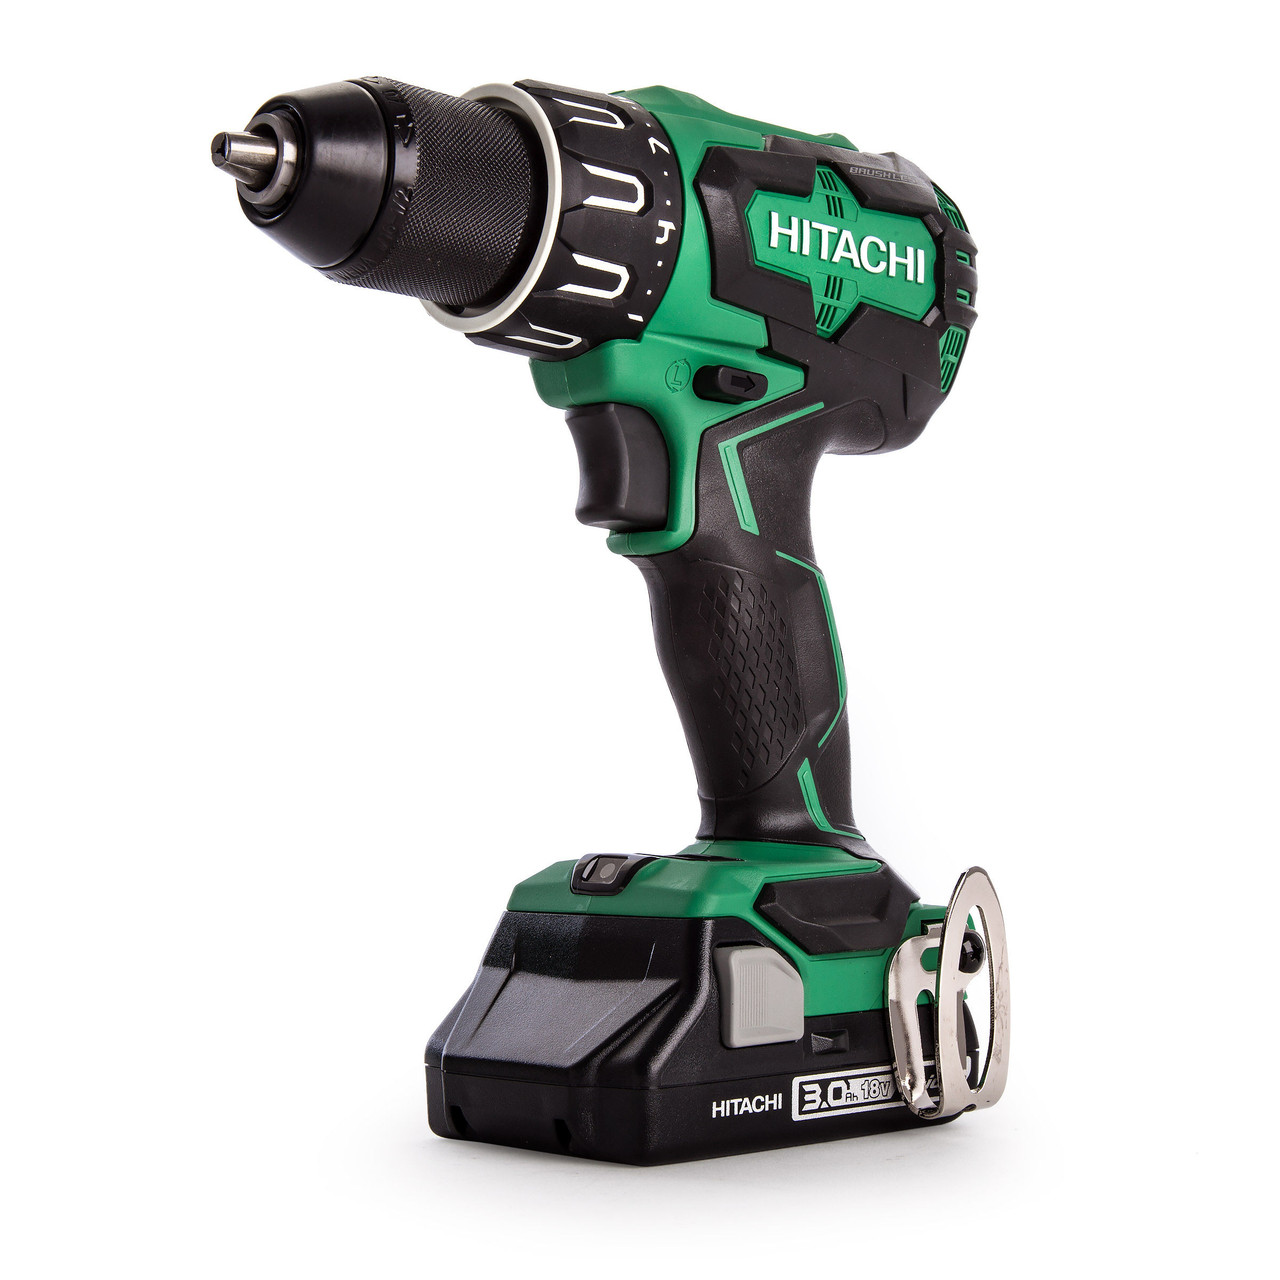 Hitachi DV18DBFL2 18V Brushless Combi Drill 2 x 3Ah Batteries,Charger /& Case